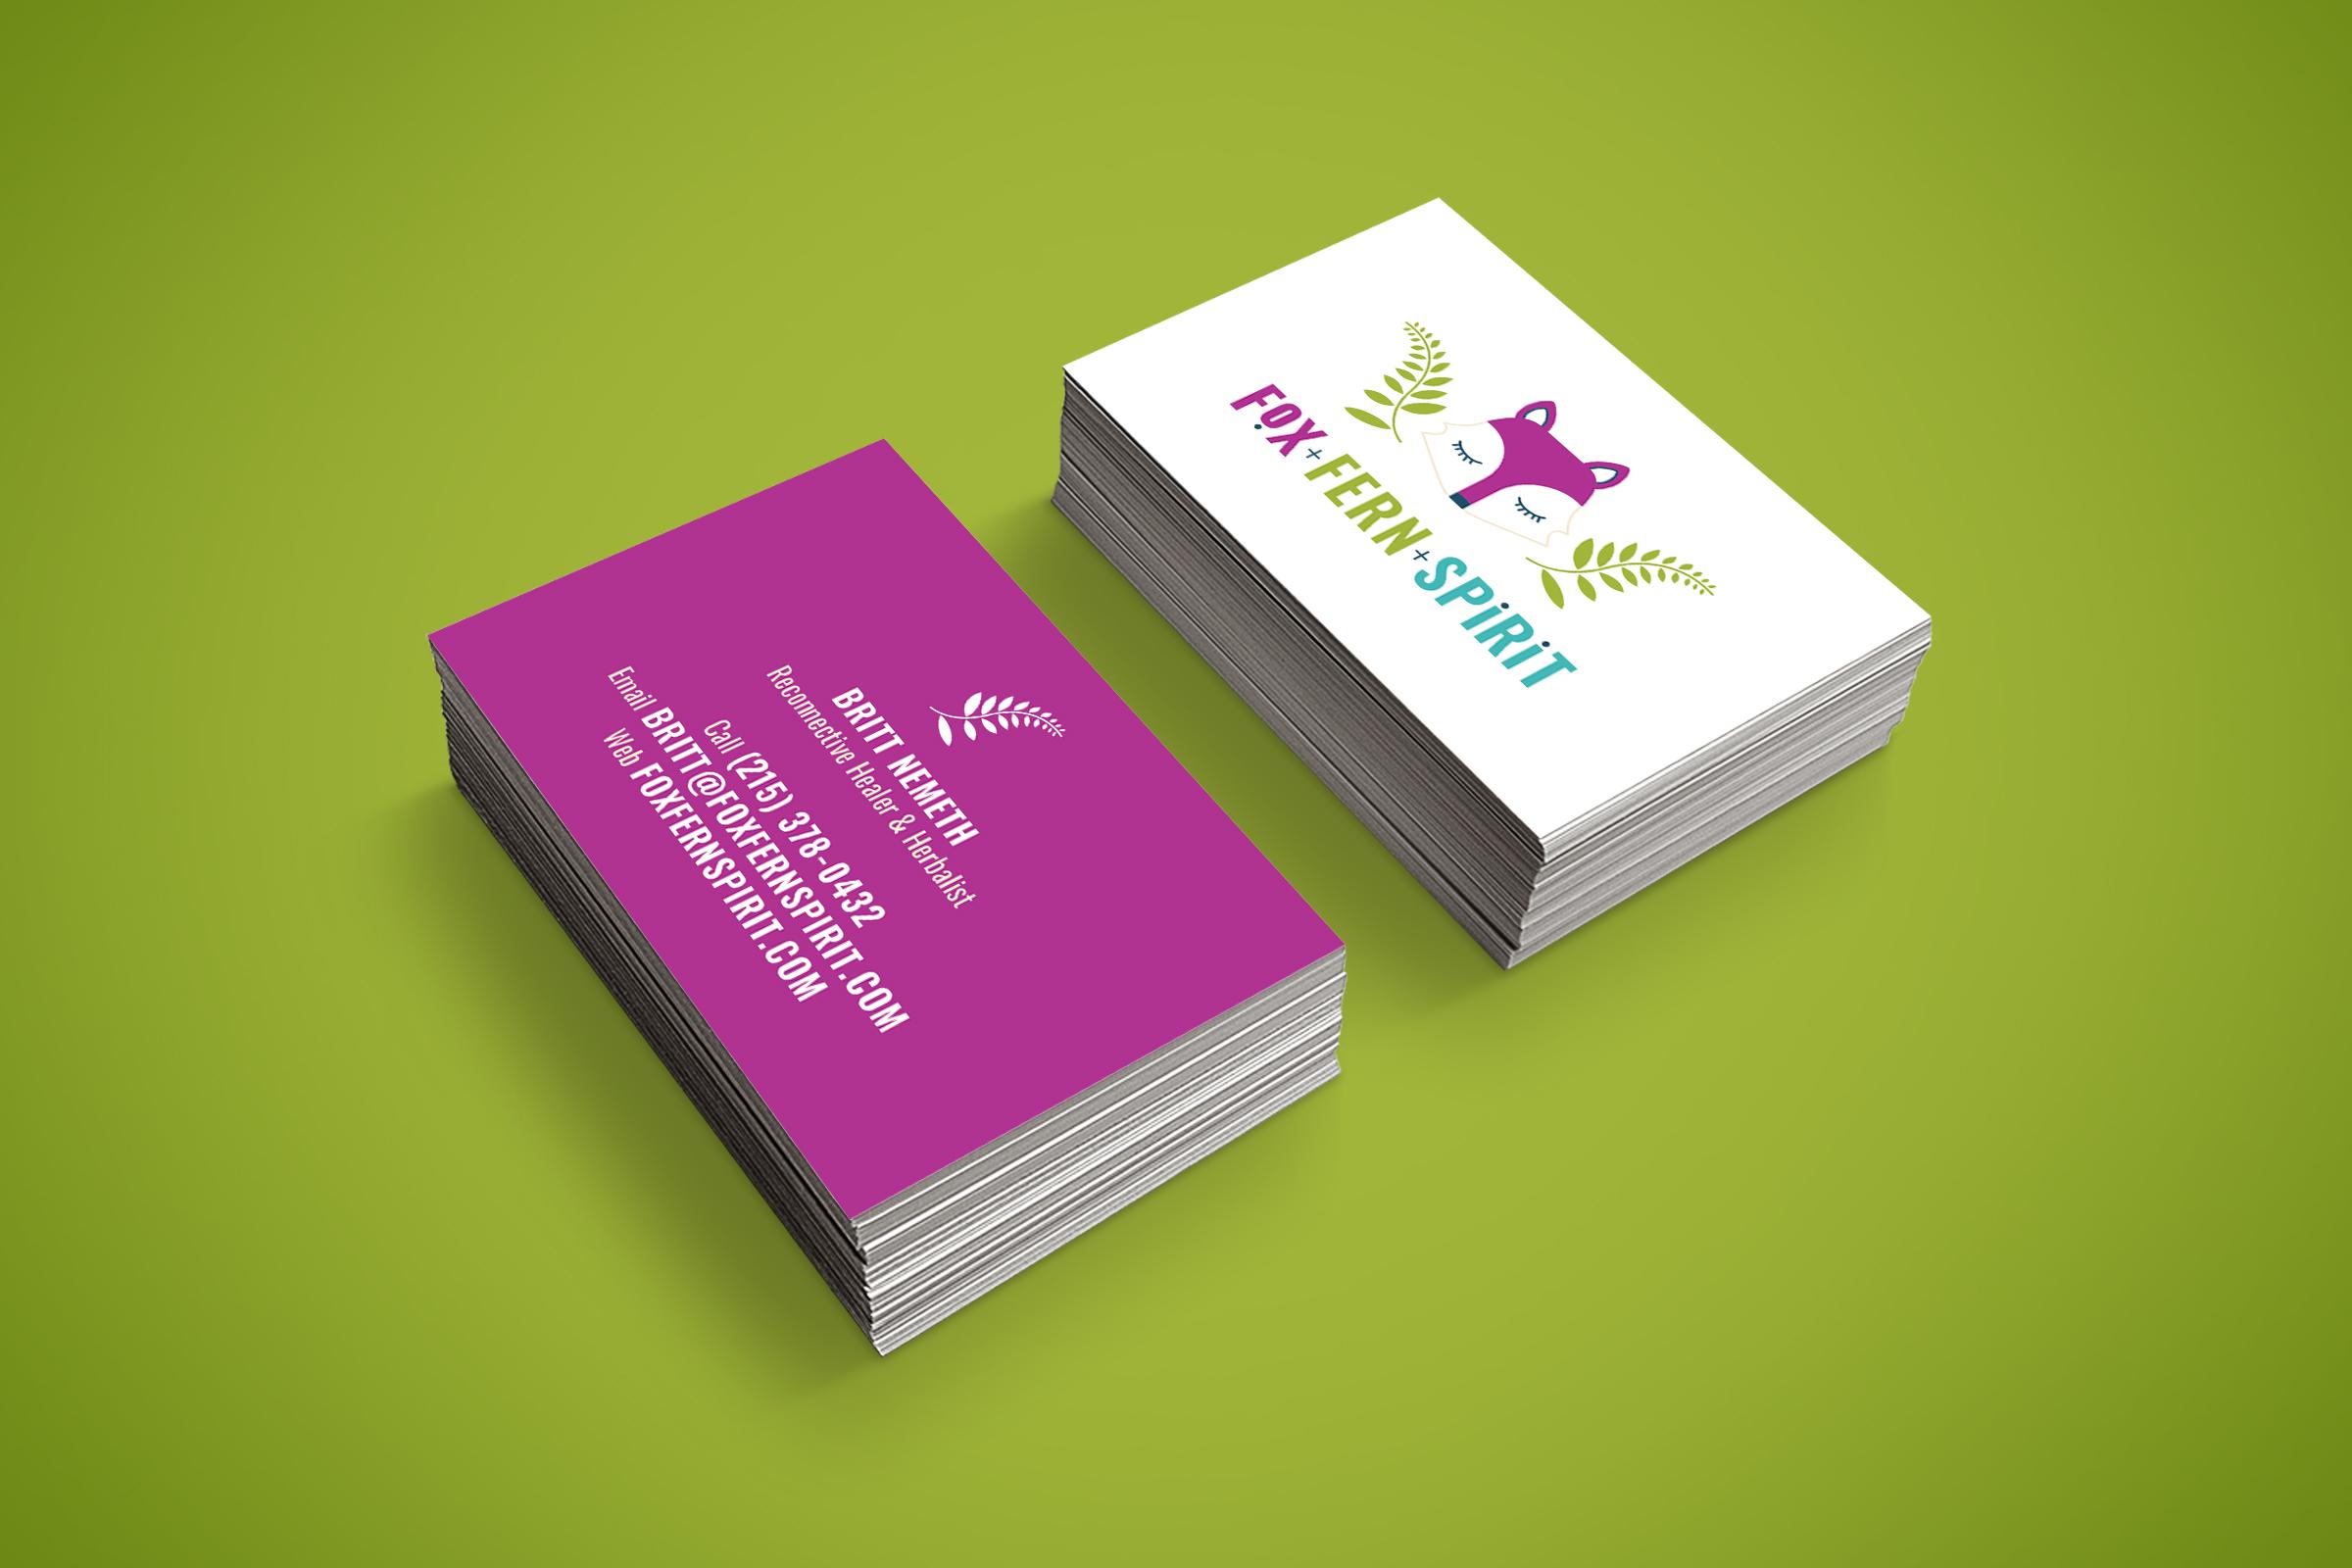 hearthfire-creative-logo-brand-identity-designer-denver-colorado-fox-fern-spirit-4.jpg